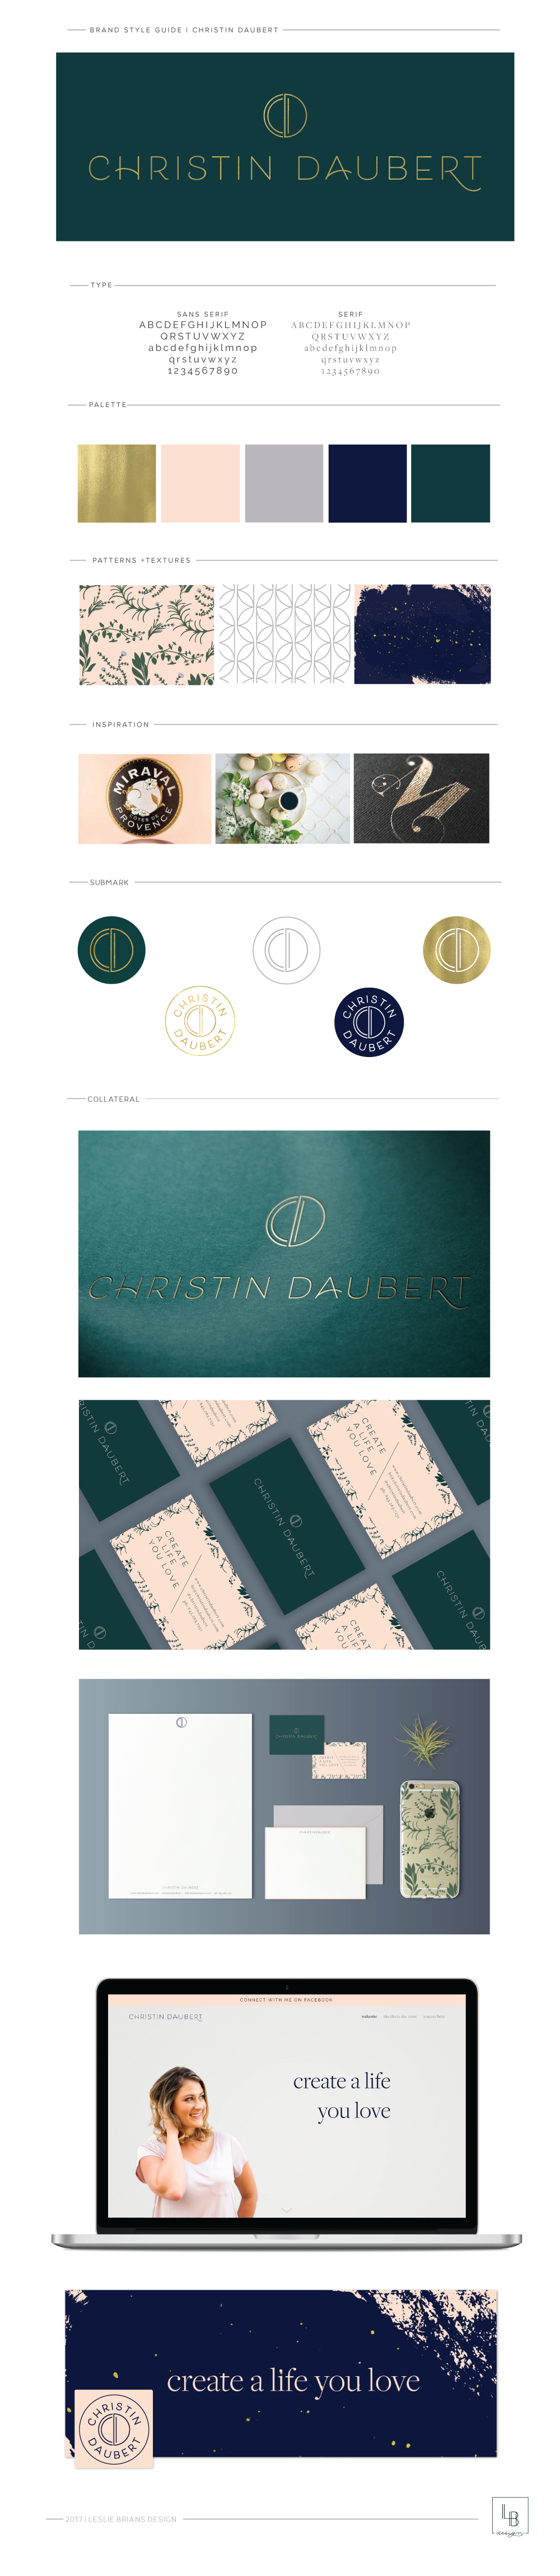 CD_branding.png